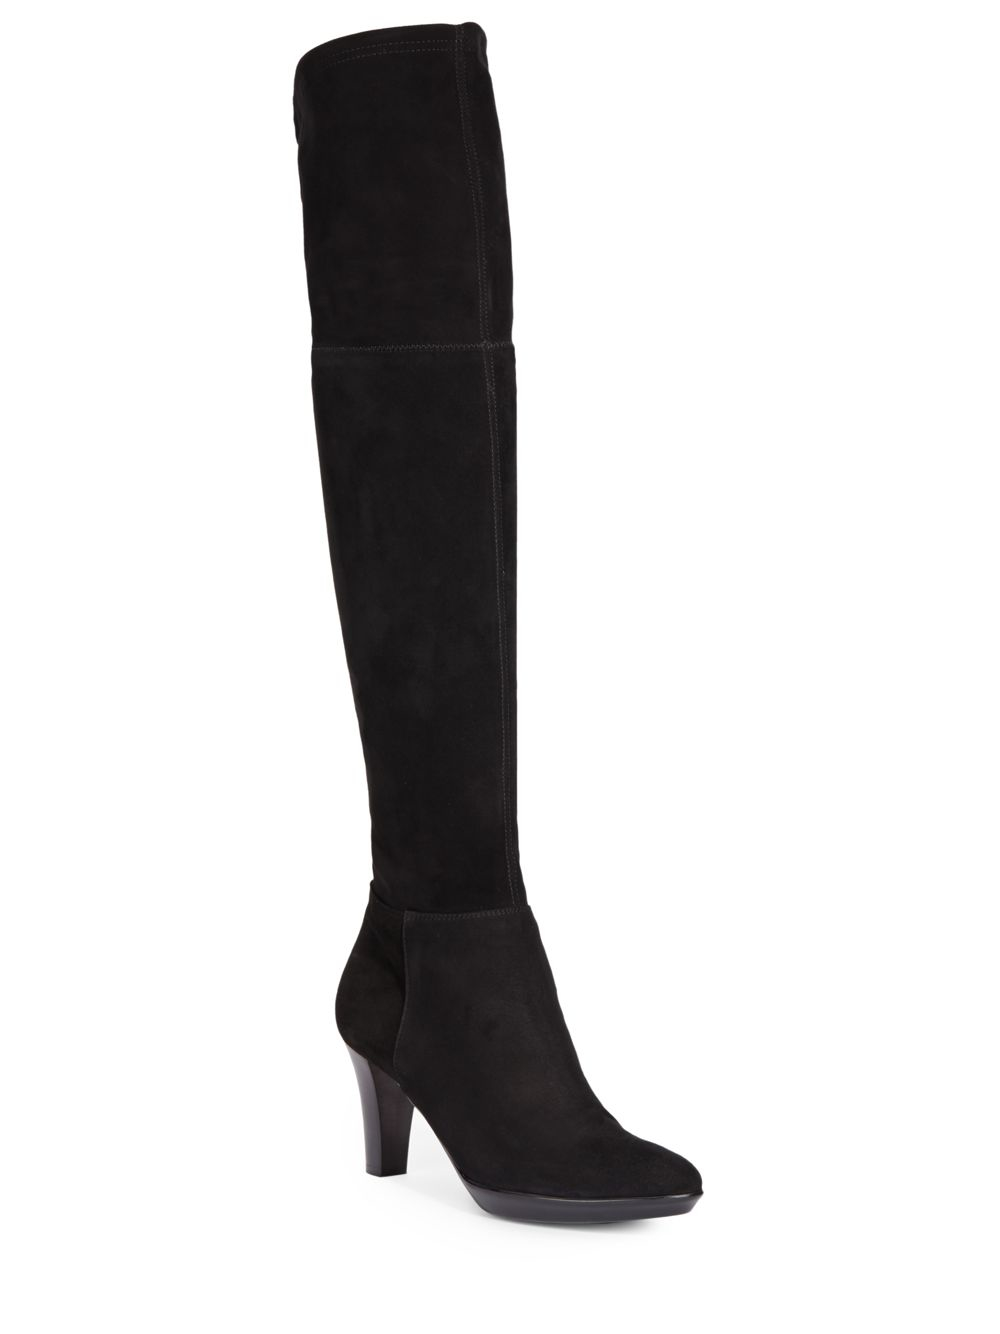 aquatalia suede thigh high boots in black lyst